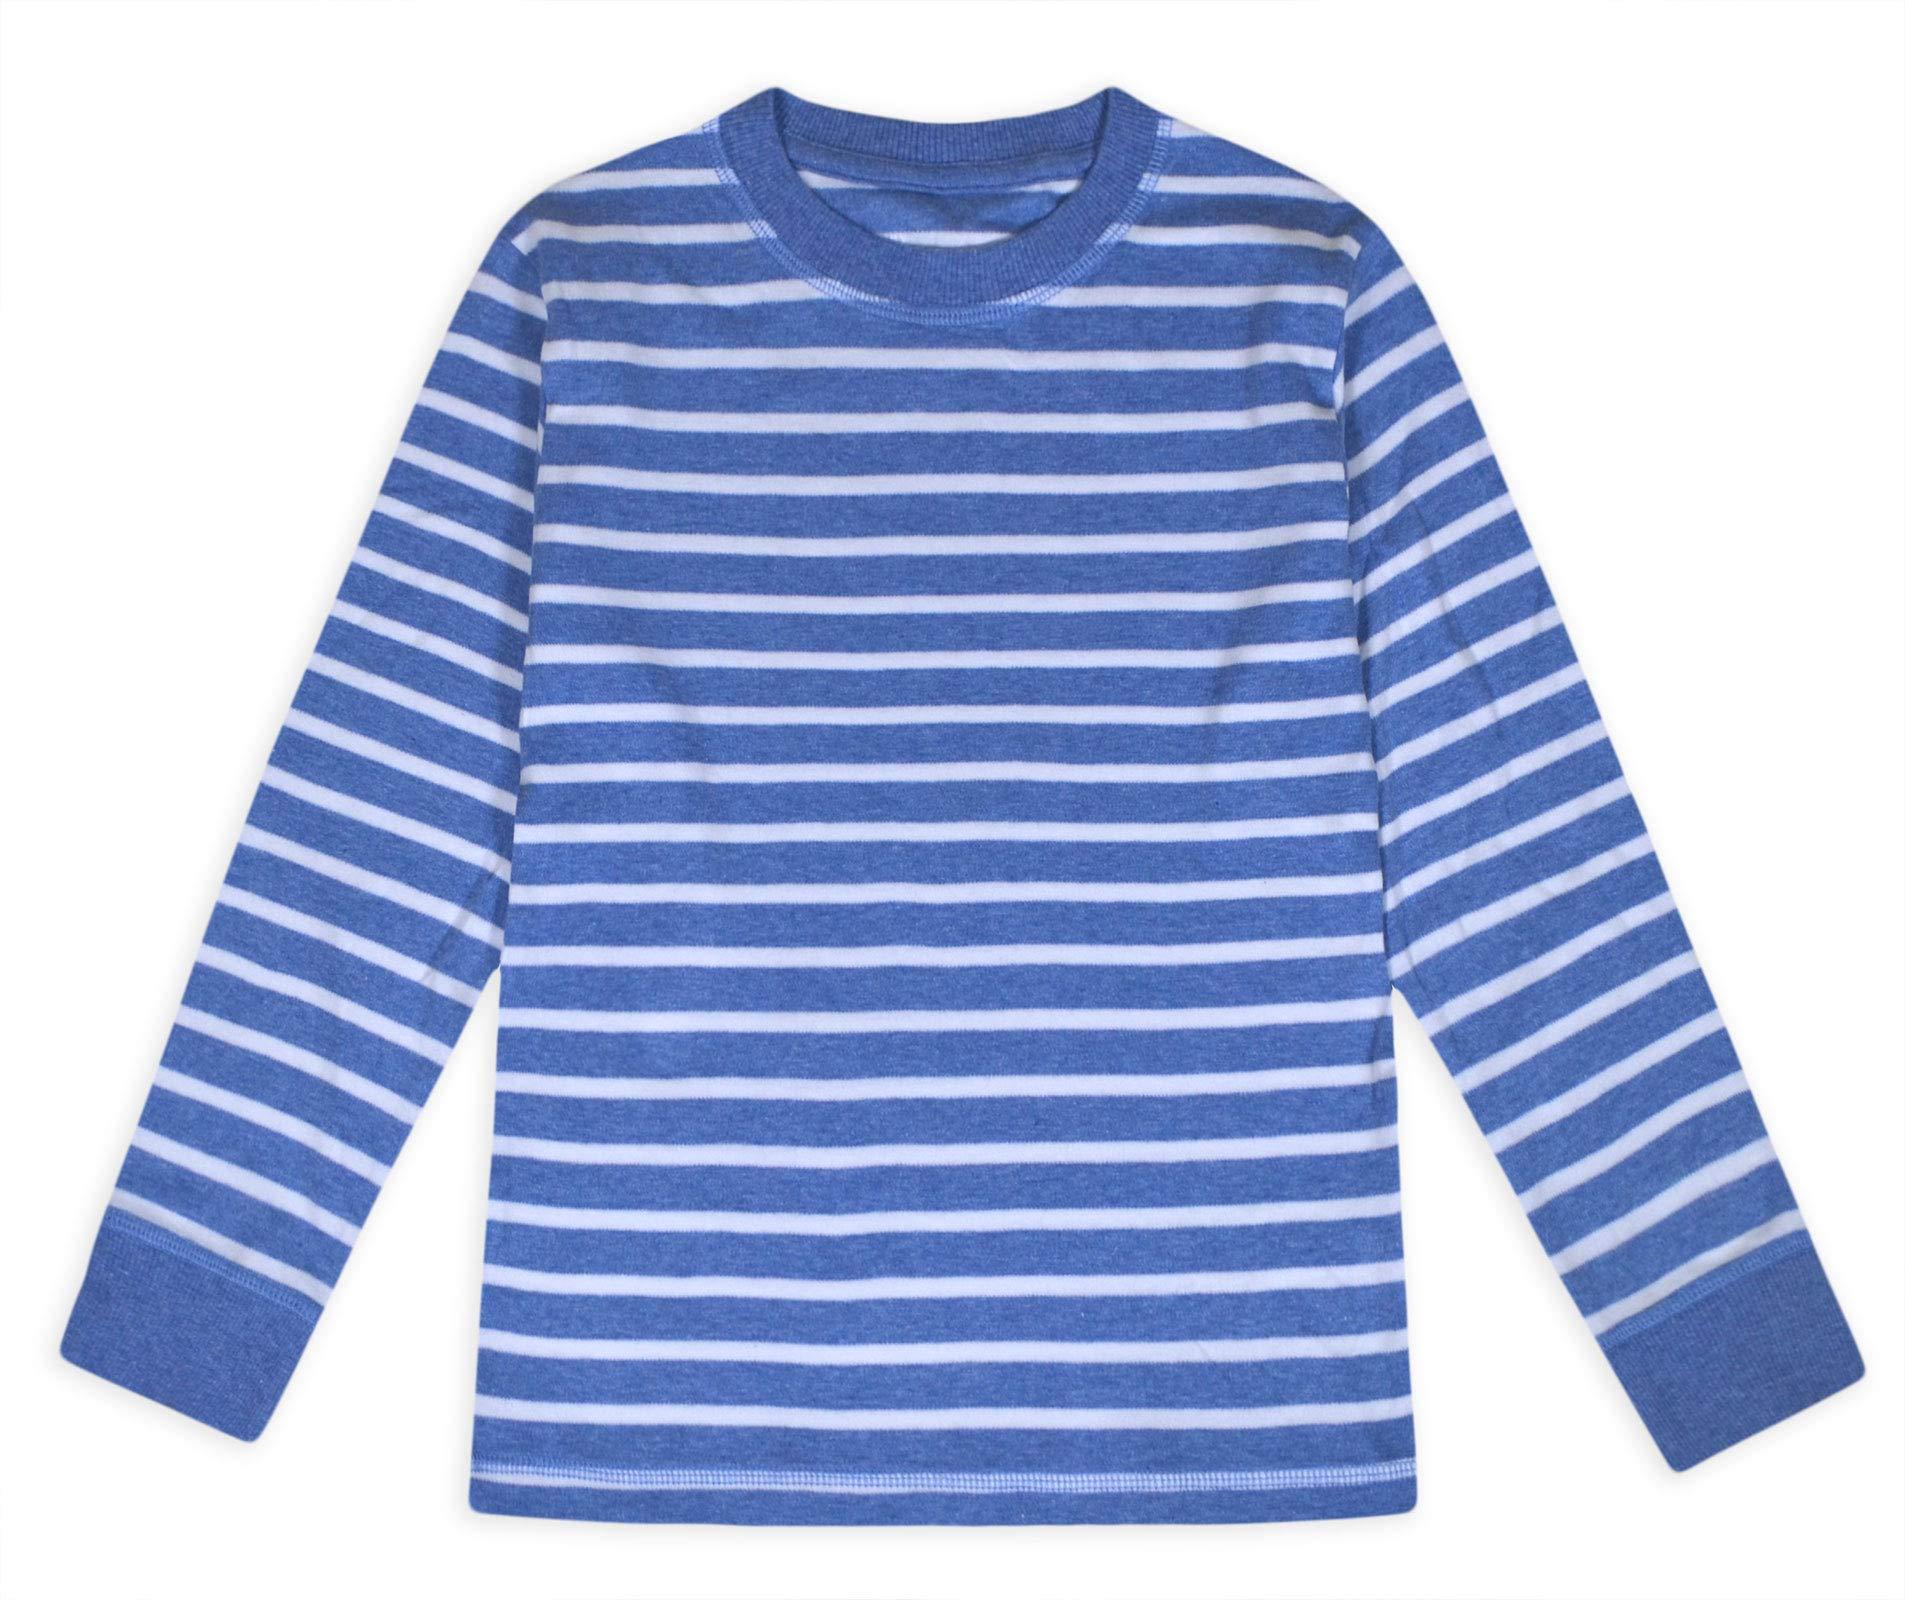 Machine Washable Full Length /& Floral jolly rascals Girls Nightwear Cotton Blend Crew Neck